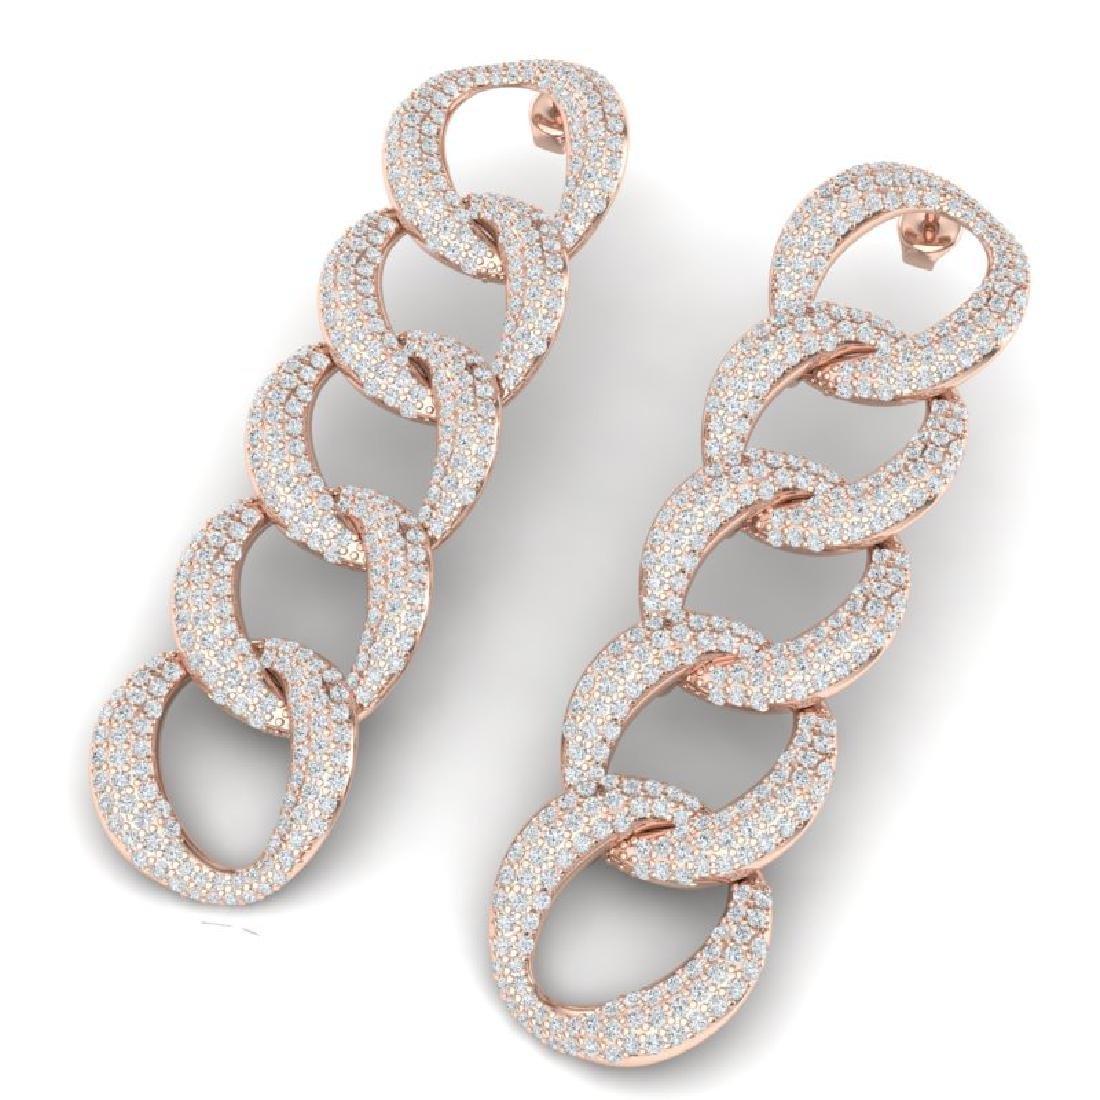 5 CTW Certified VS/SI Diamond Earrings 18K Rose Gold